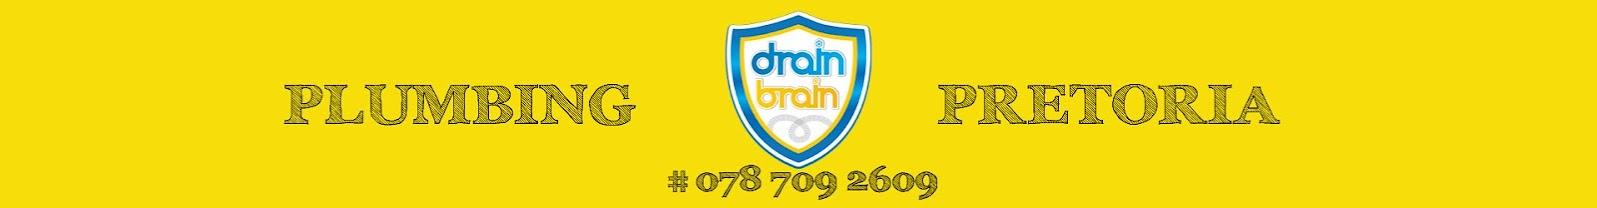 Cleaning Drains in Pretoria